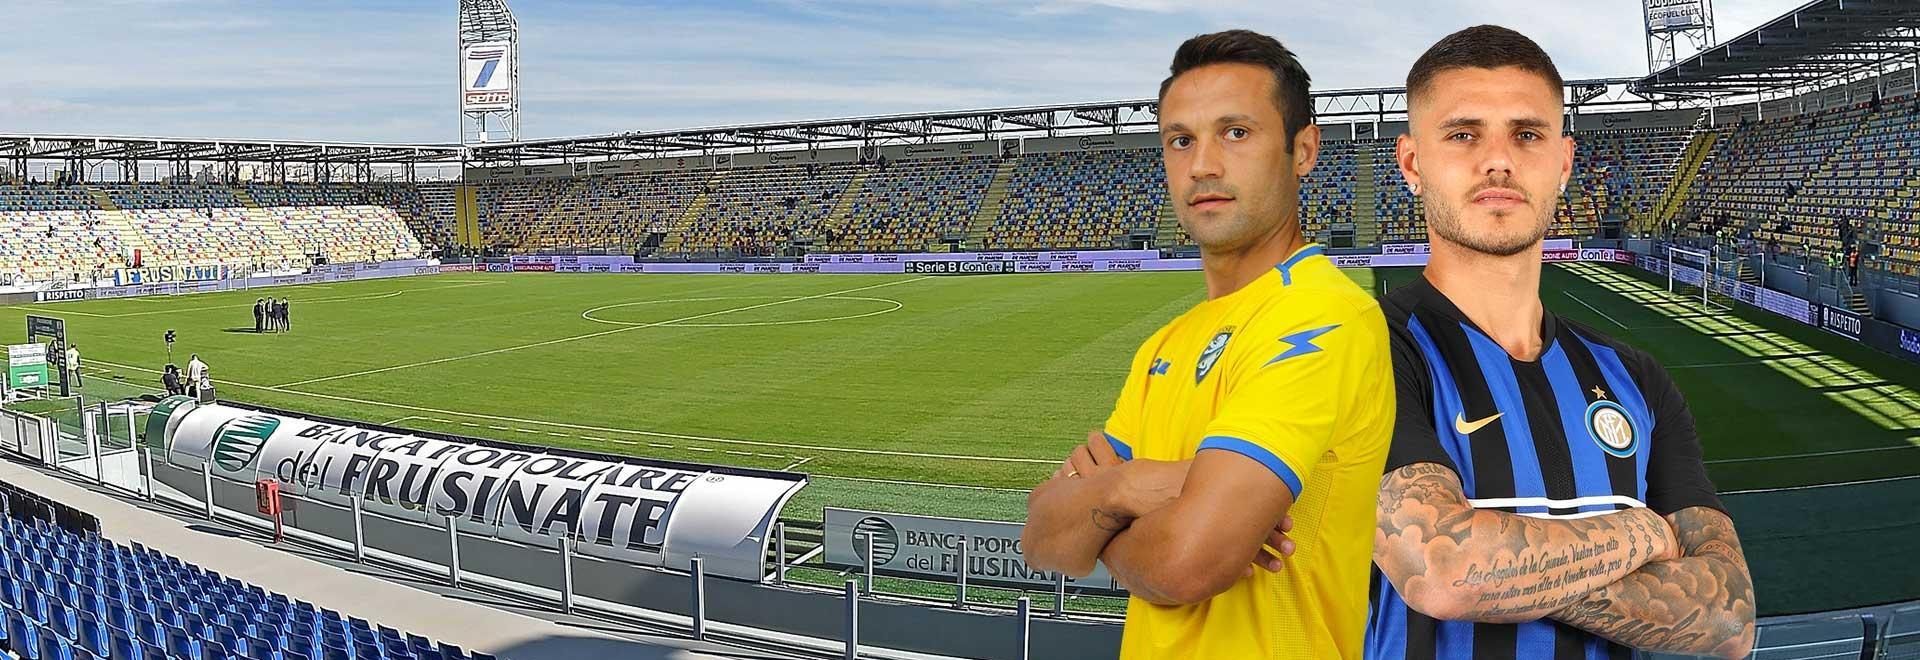 Frosinone - Inter